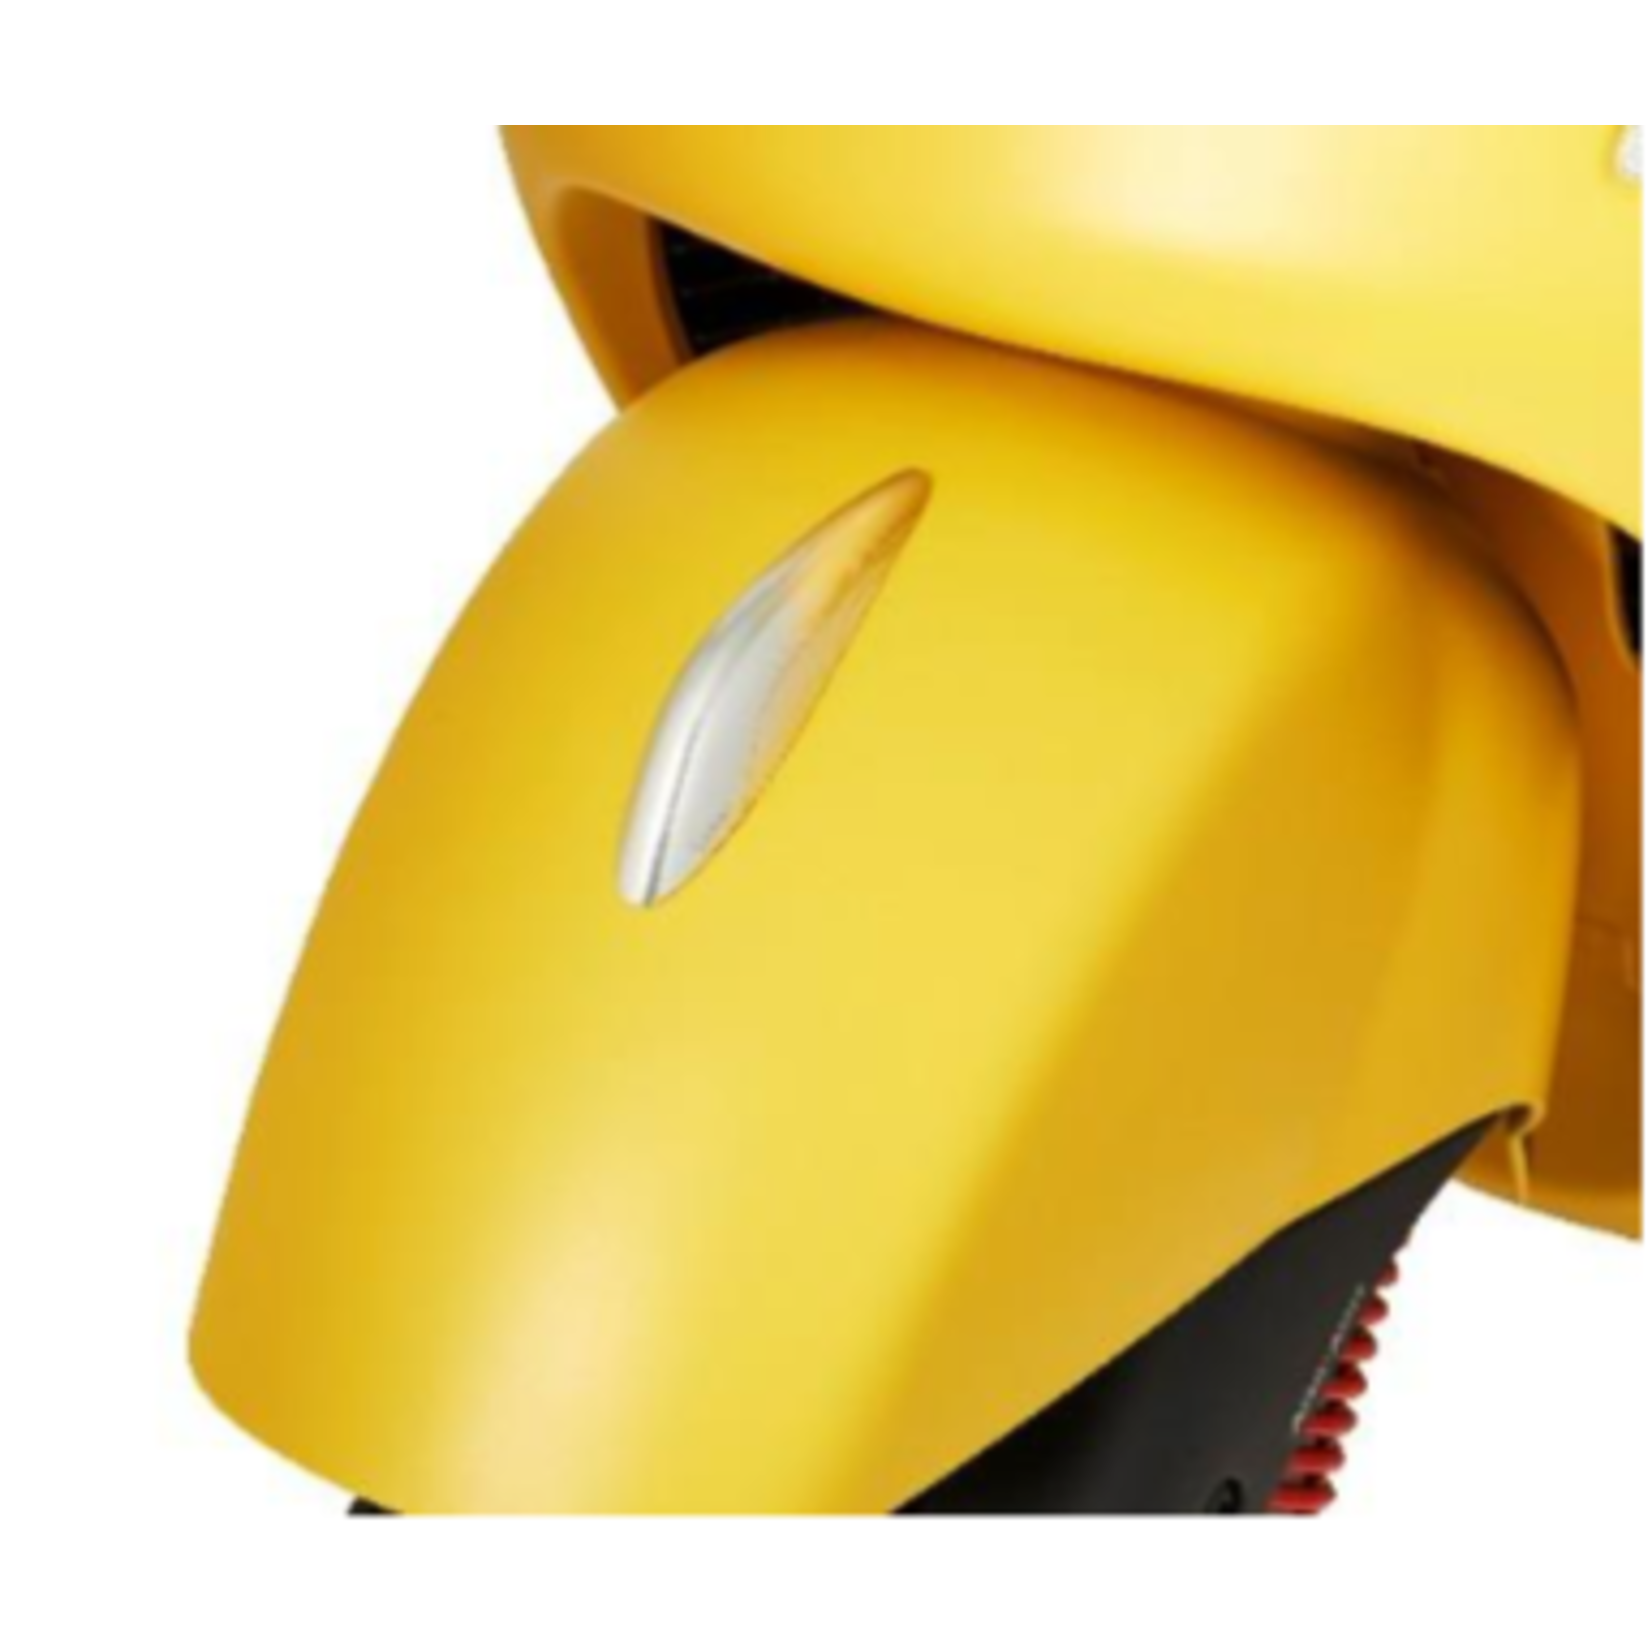 Accessories Fender Crest, RIZOMA GTS